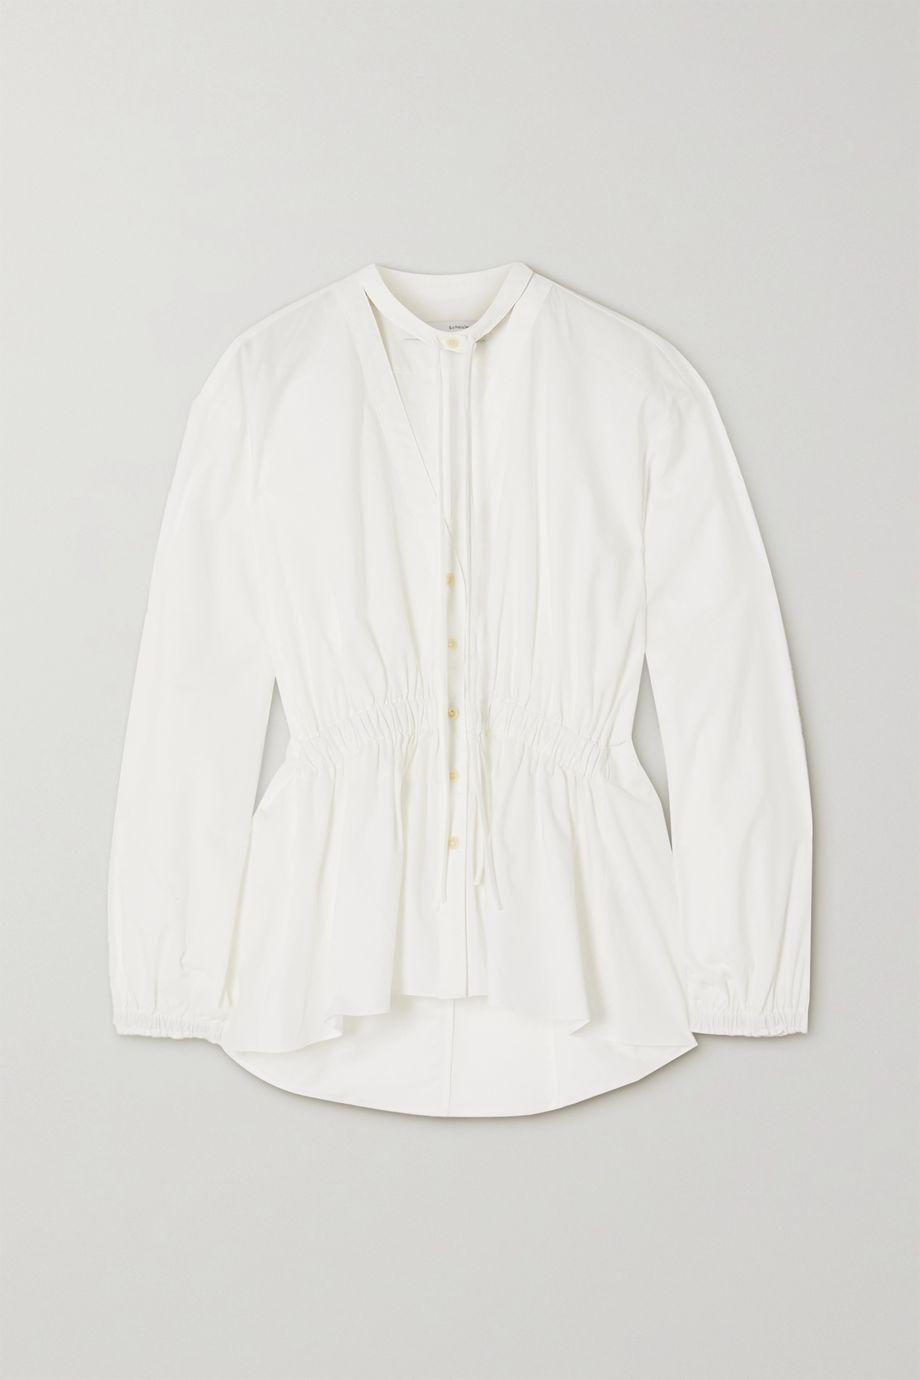 Proenza Schouler White Label Tie-detailed gathered cotton-poplin blouse